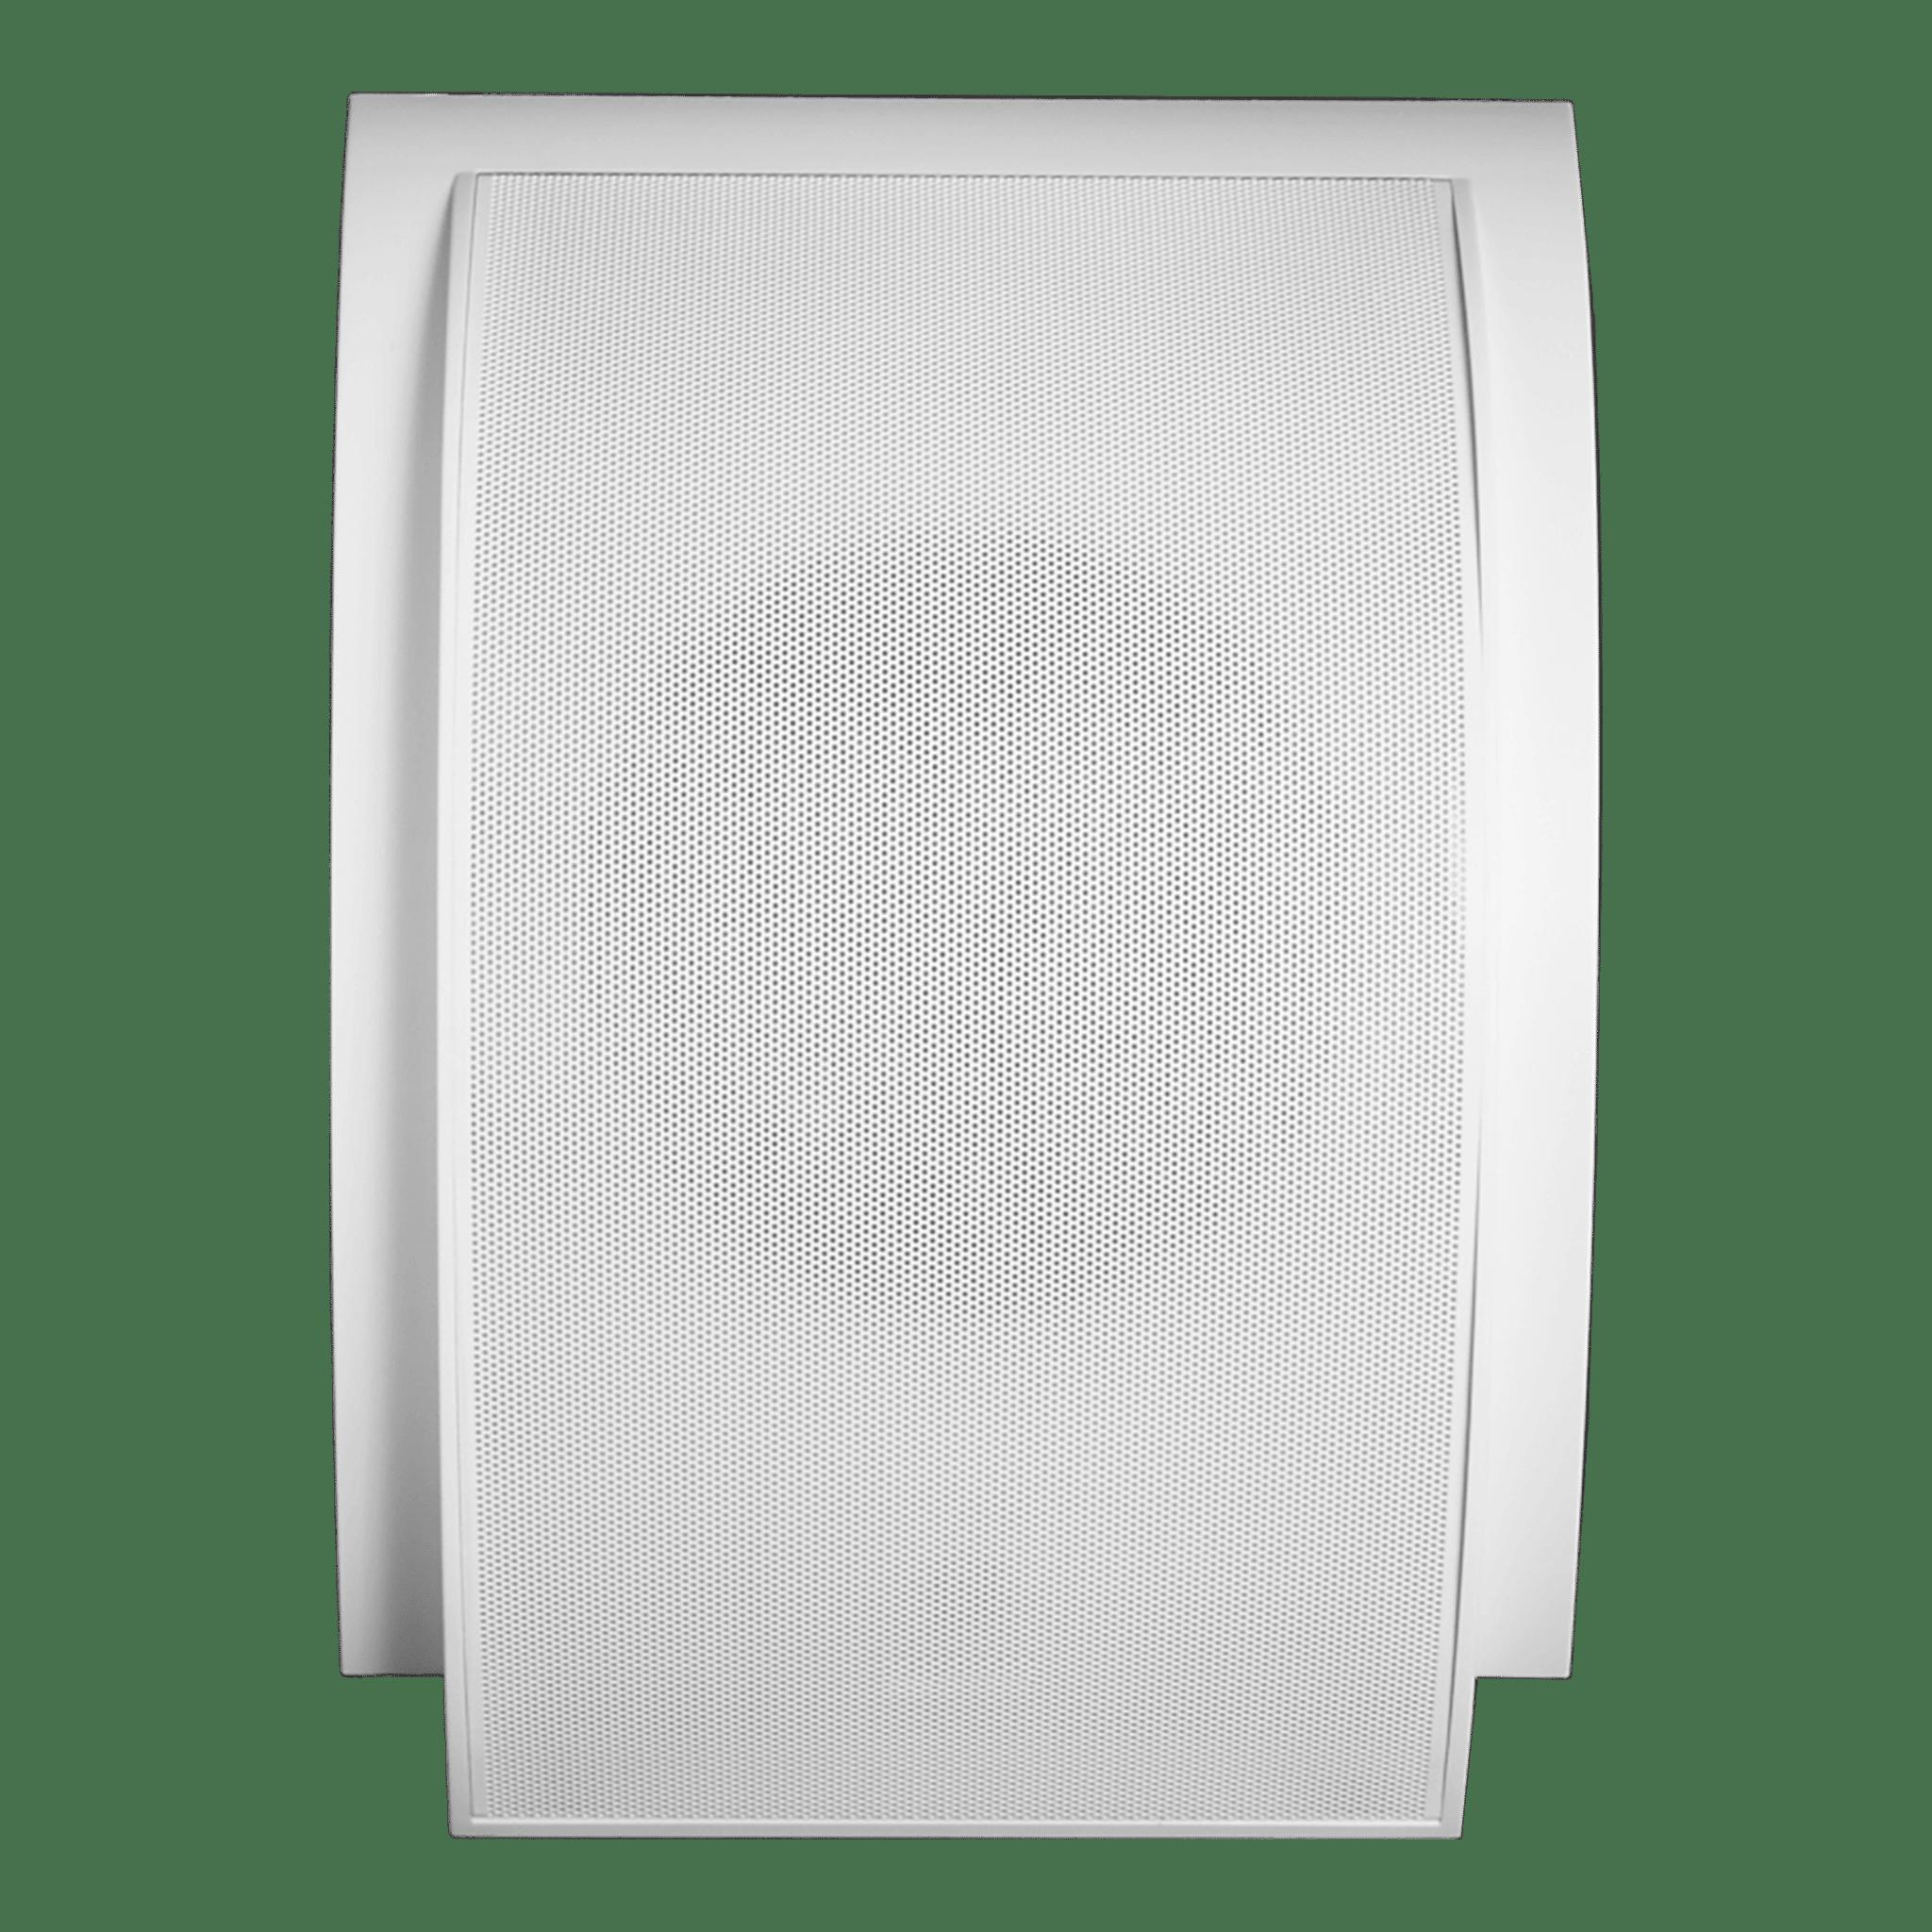 WS500 - Surface mount speaker